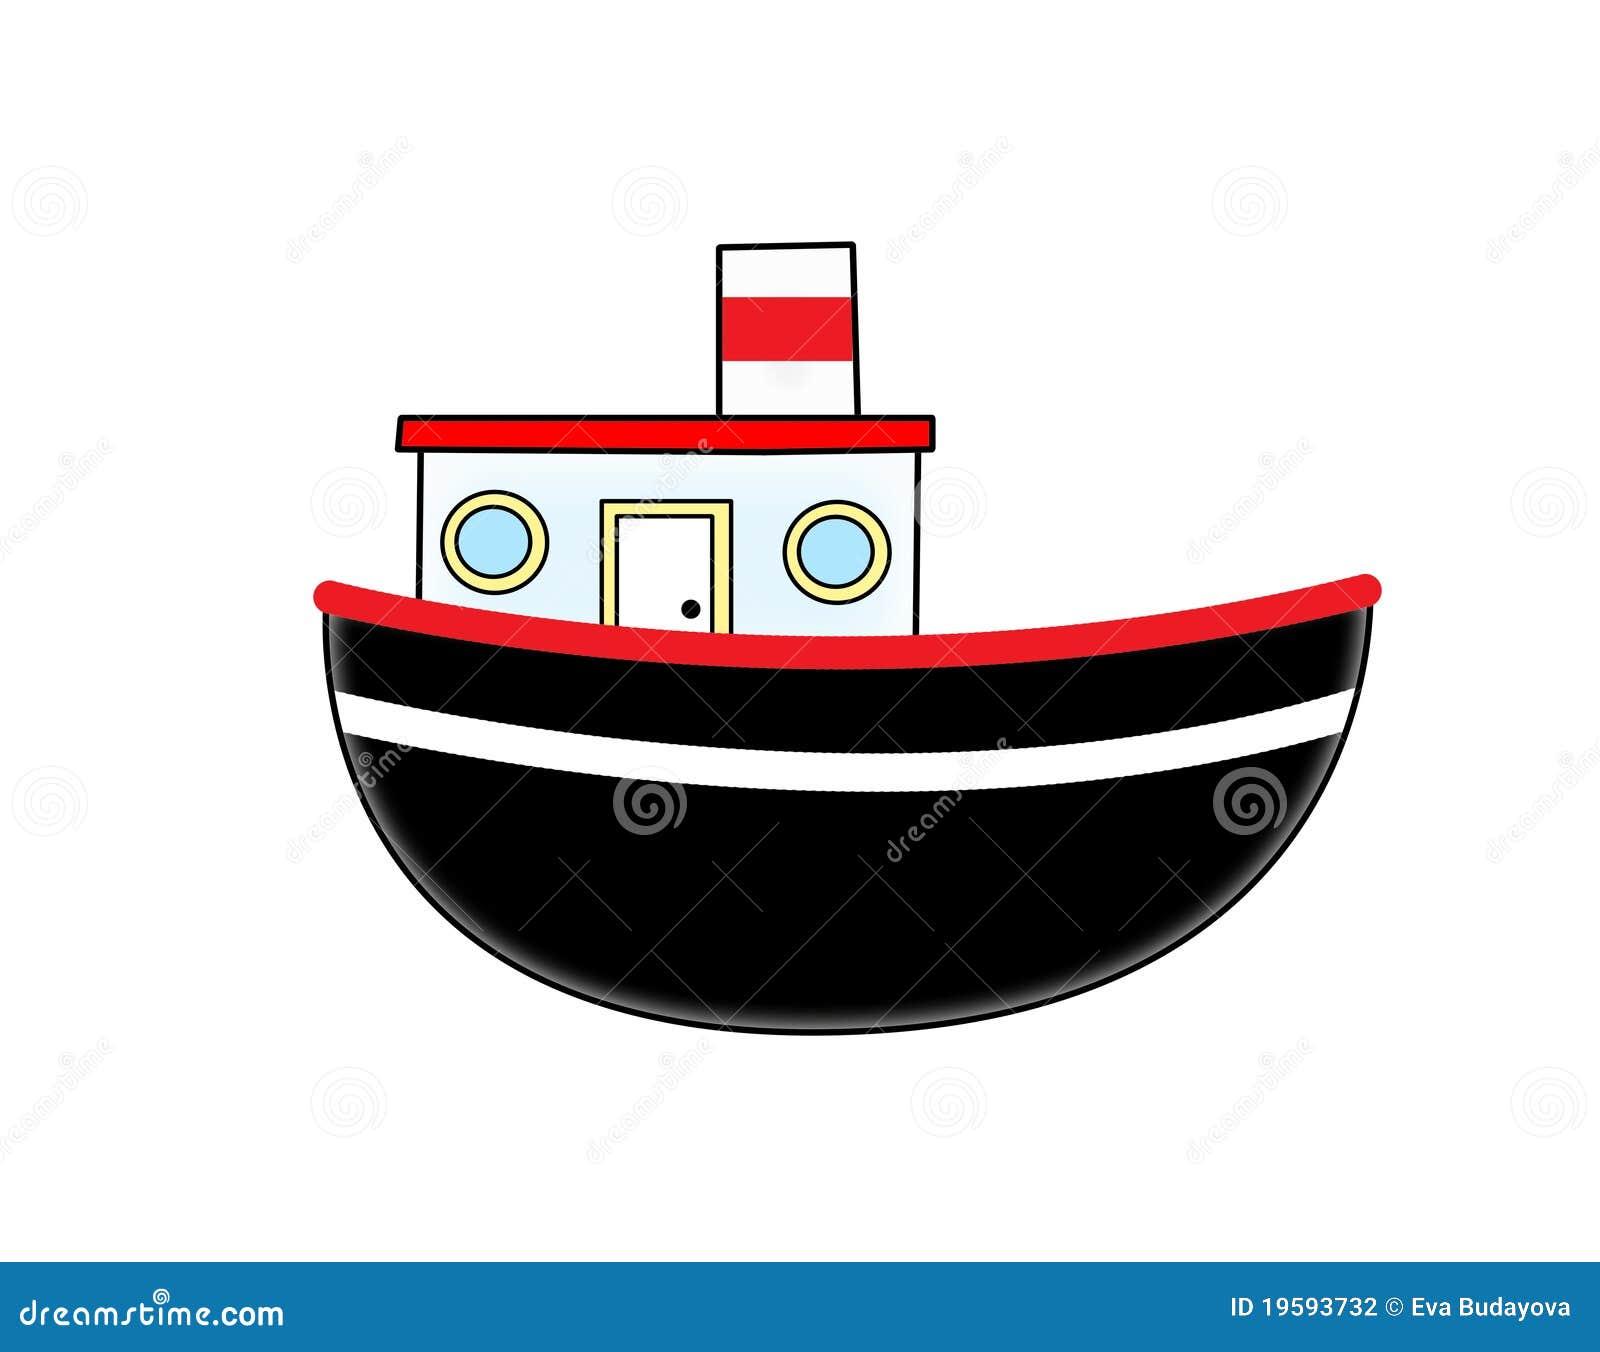 Cartoon boat stock illustration. Illustration of background - 19593732